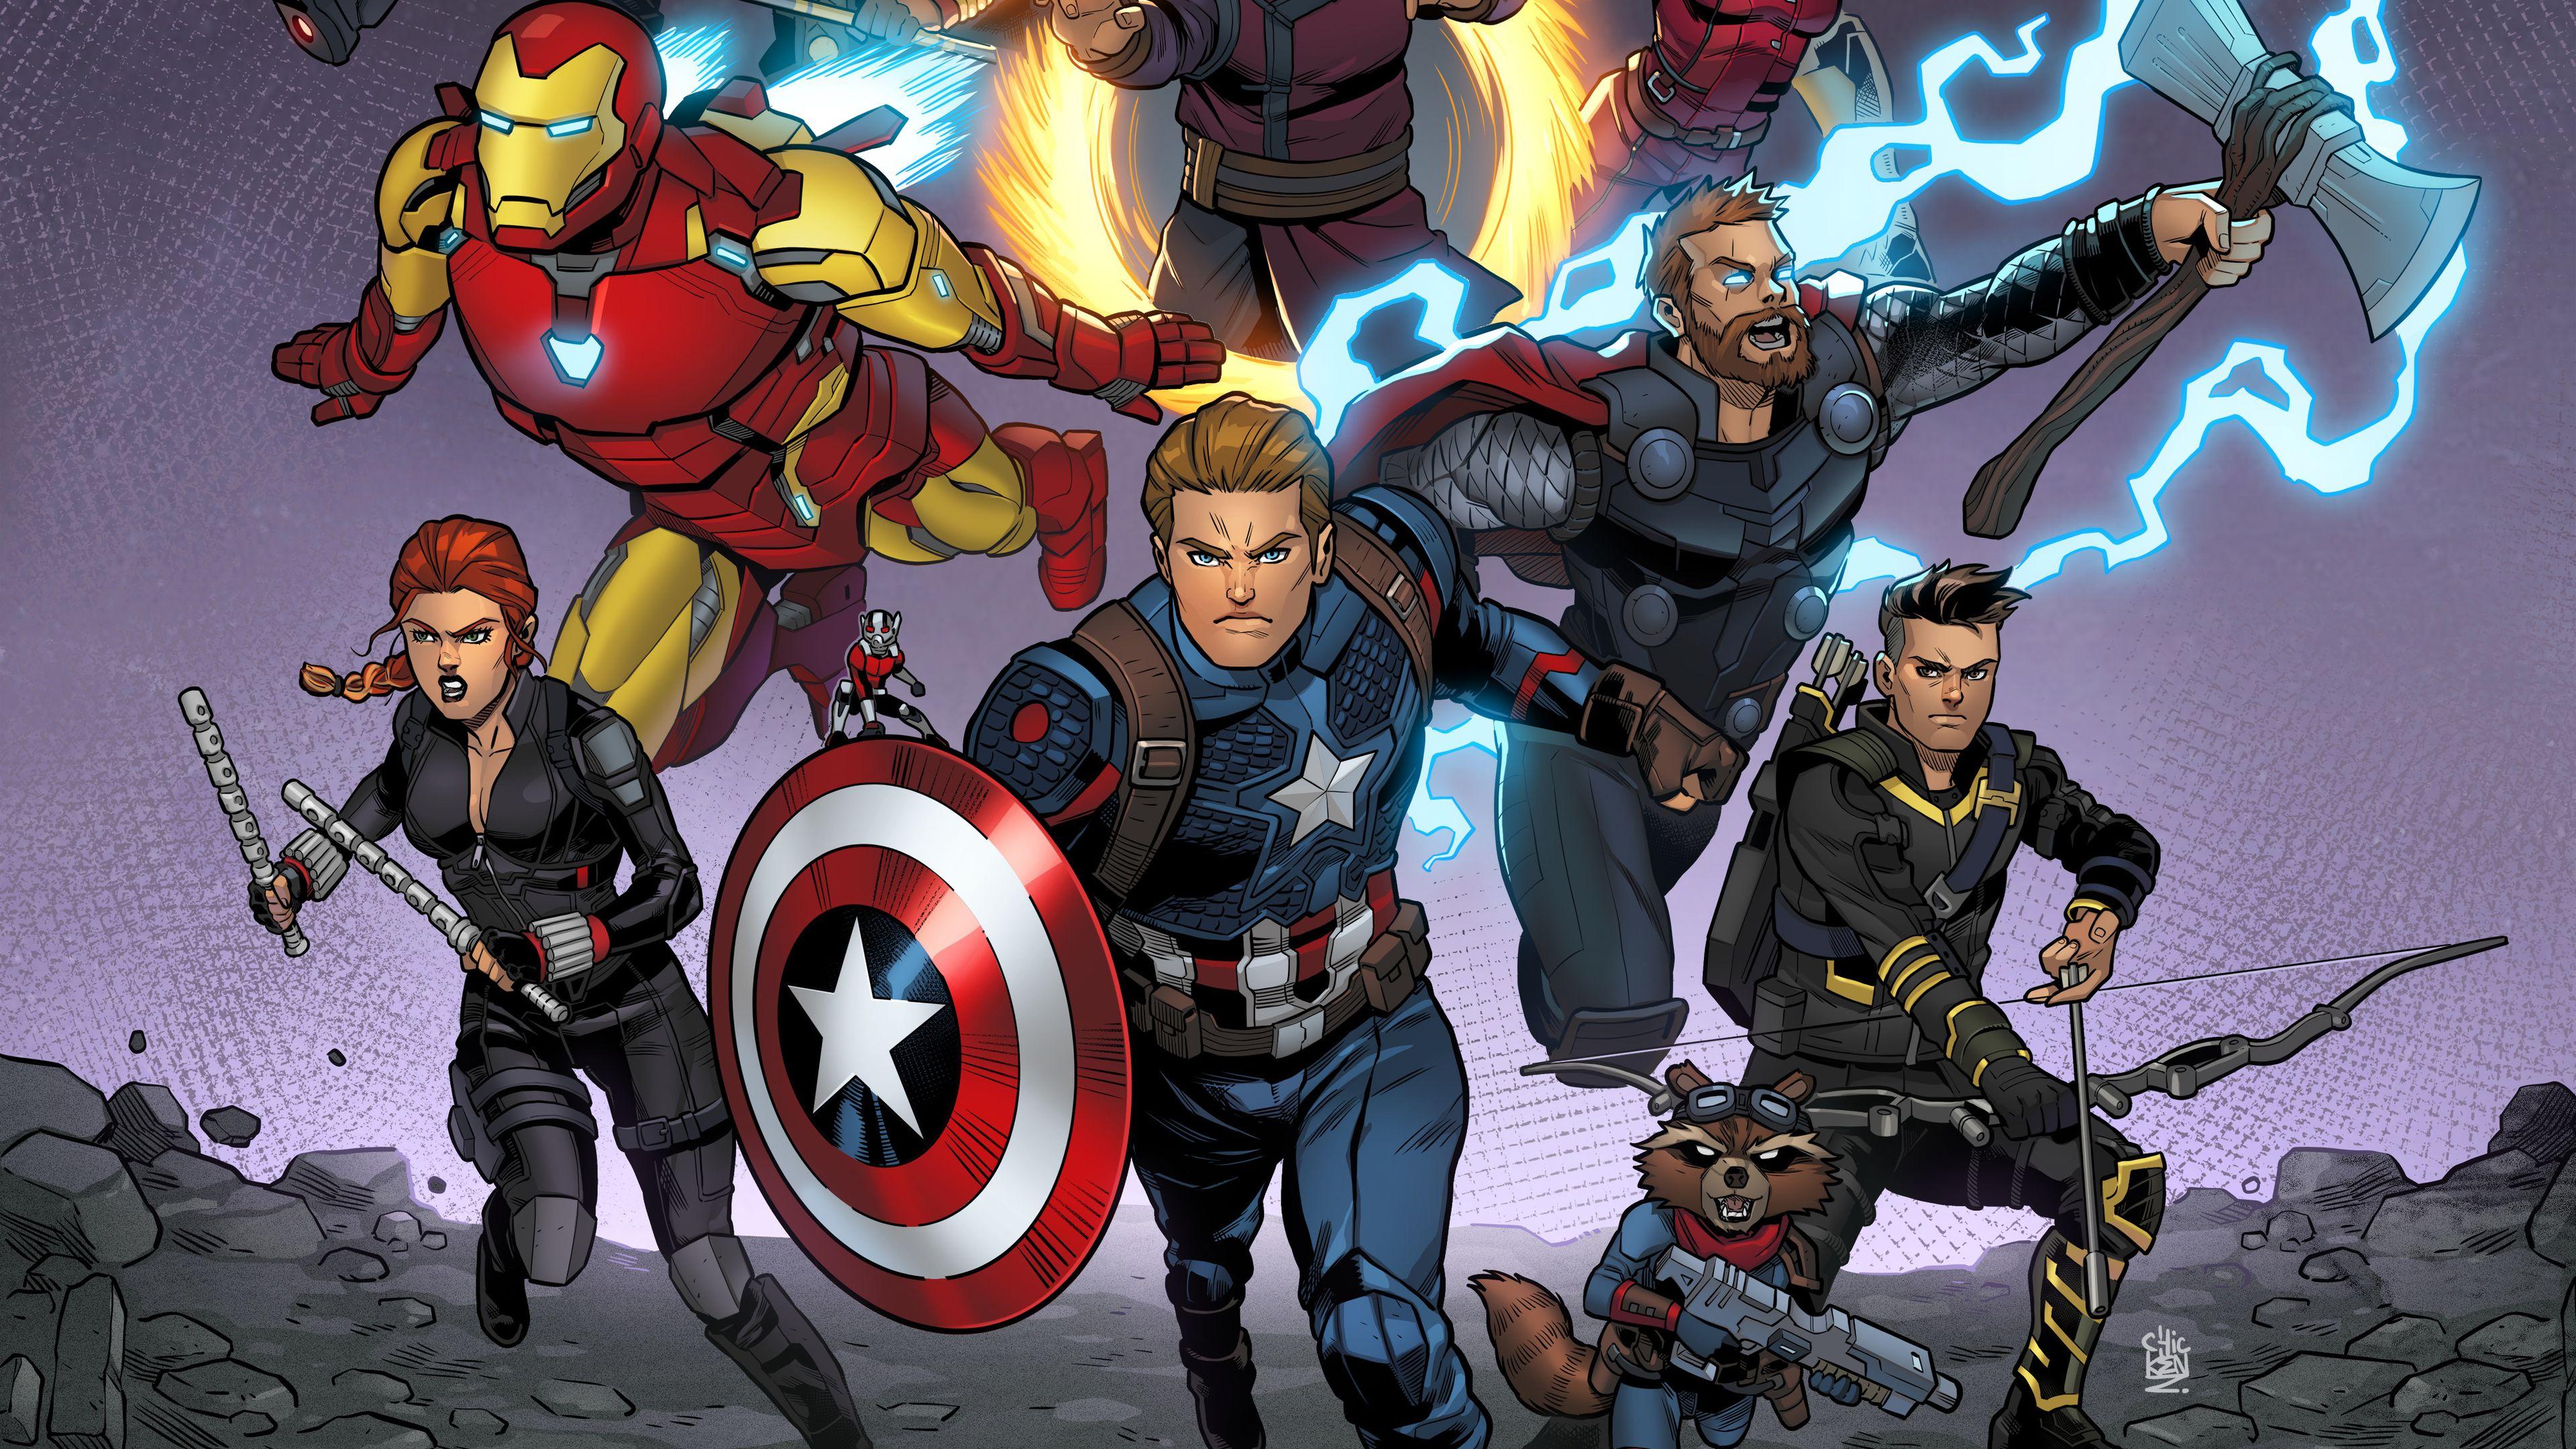 Wallpaper 4k Avengers Endgame Final Fight 2019 Movies Wallpapers